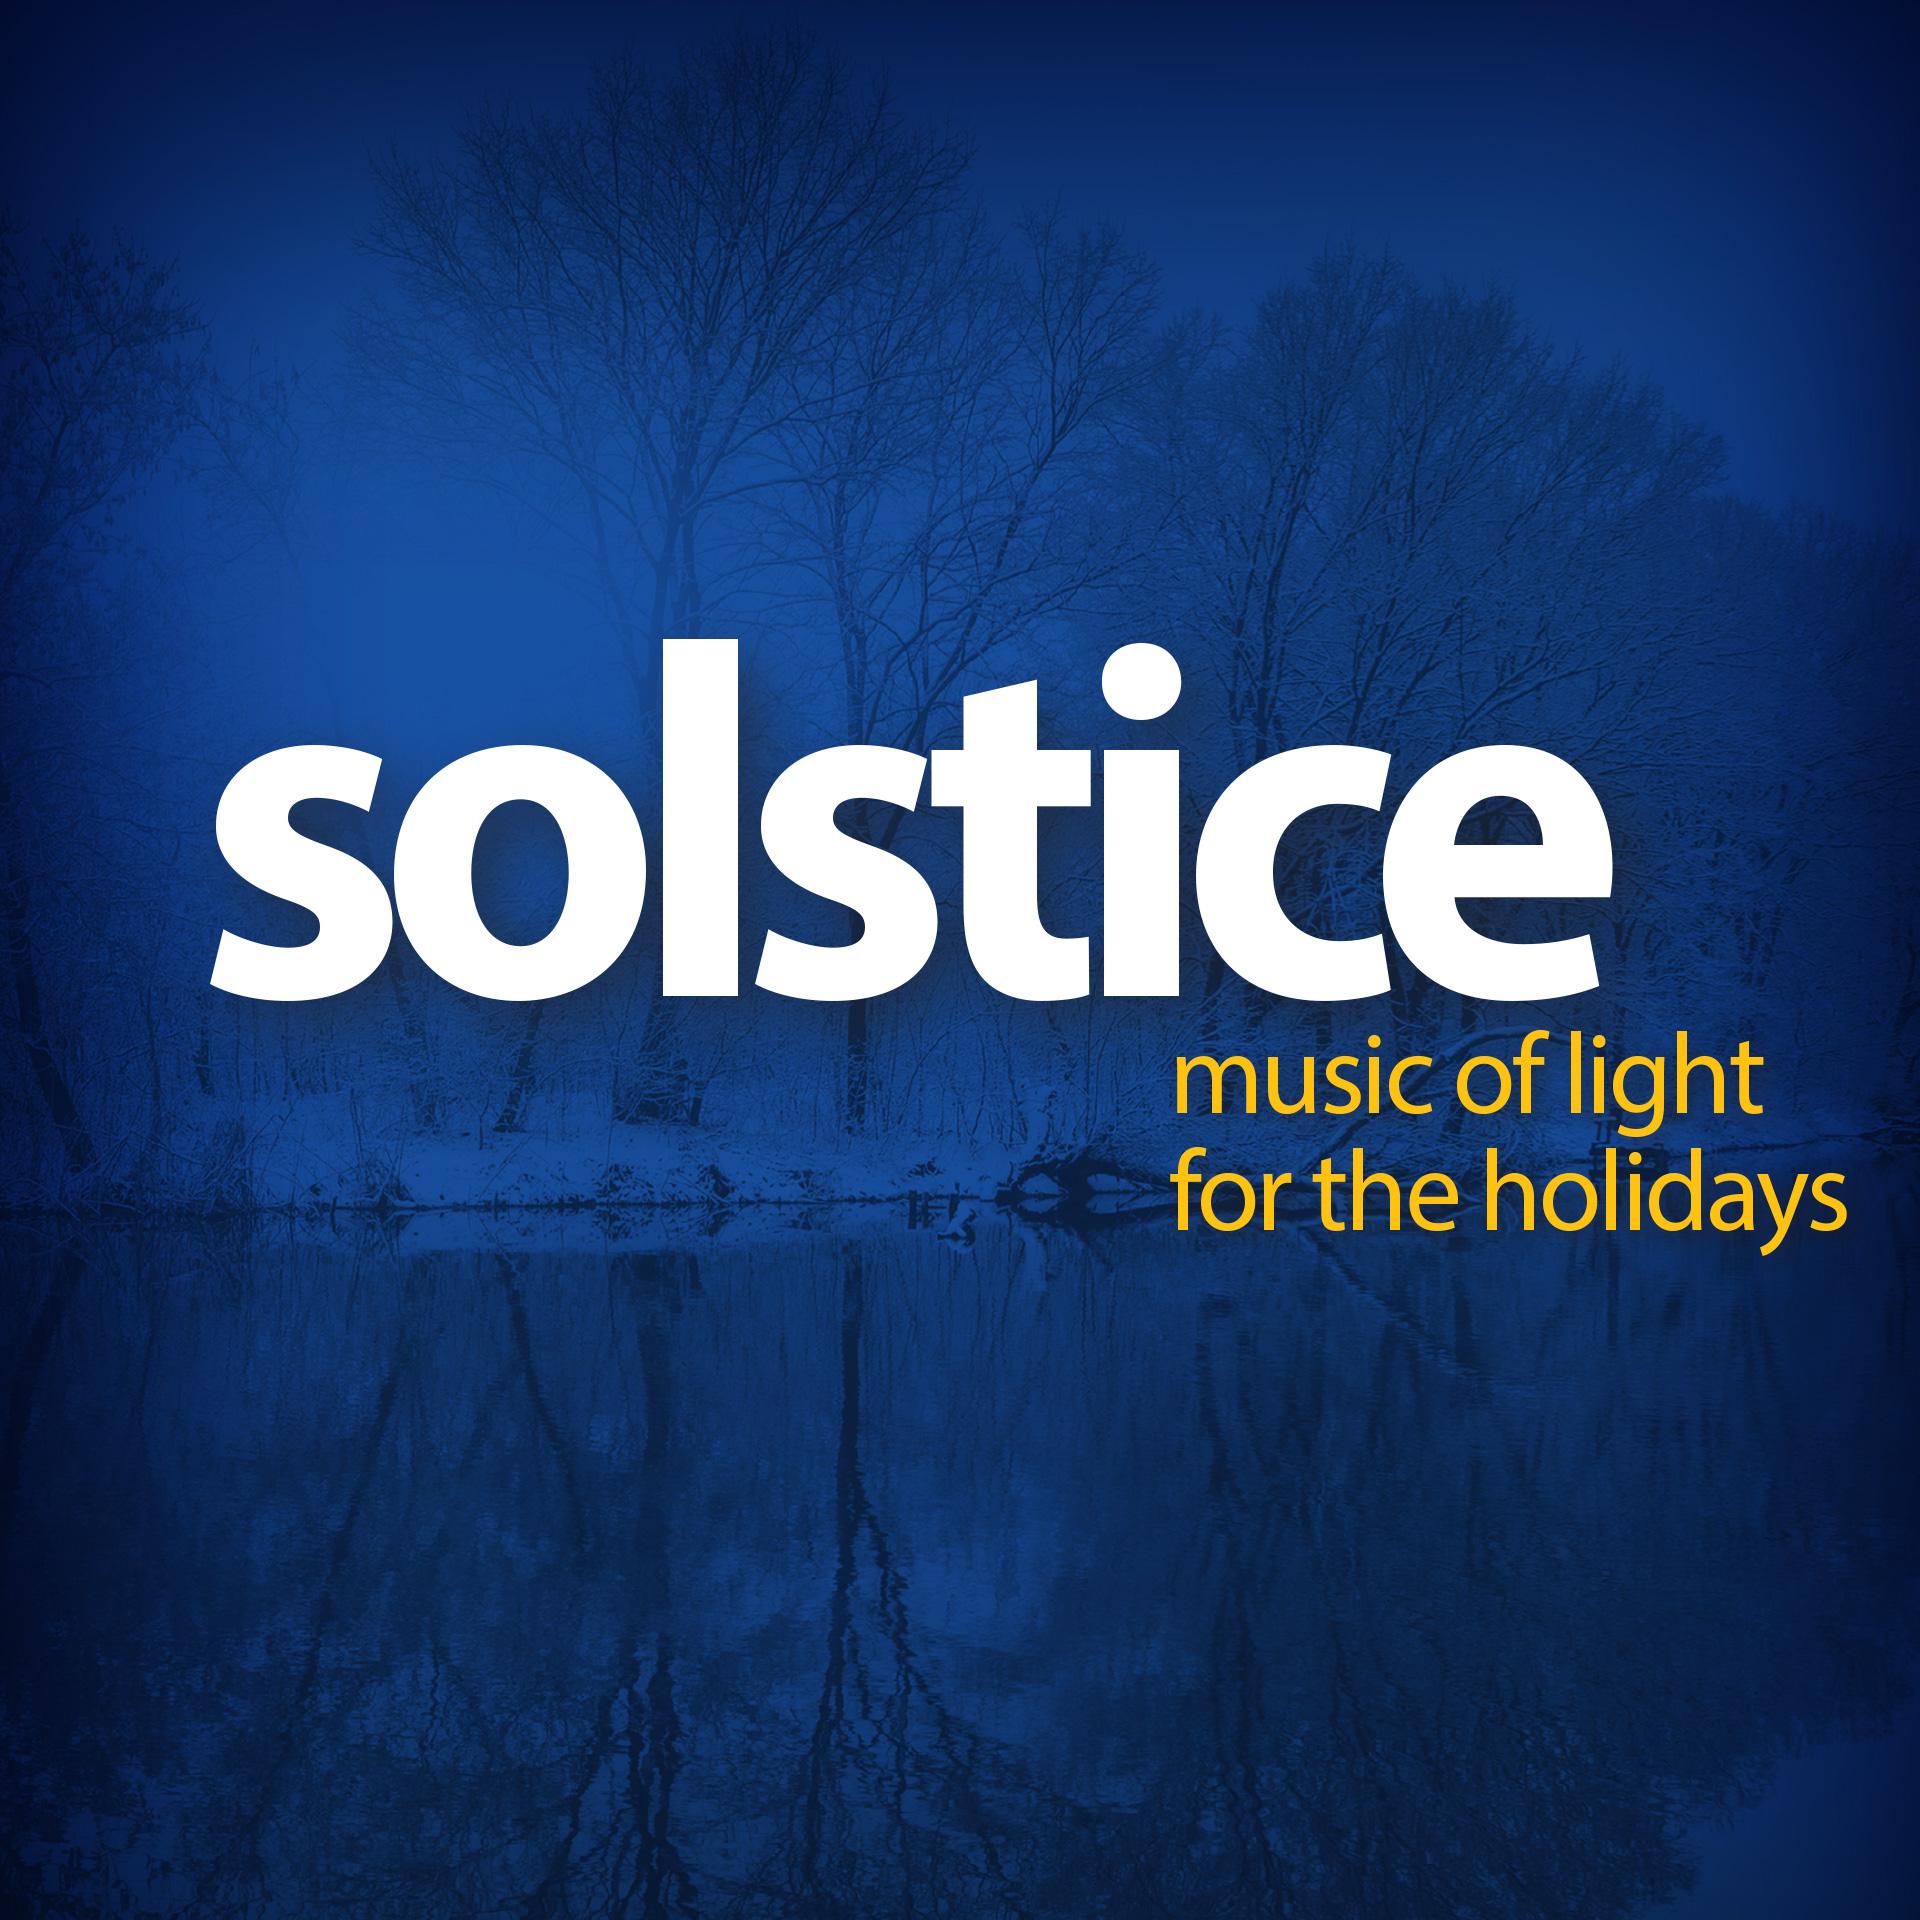 spm-2019-squarebox-solstice-no-date.jpg